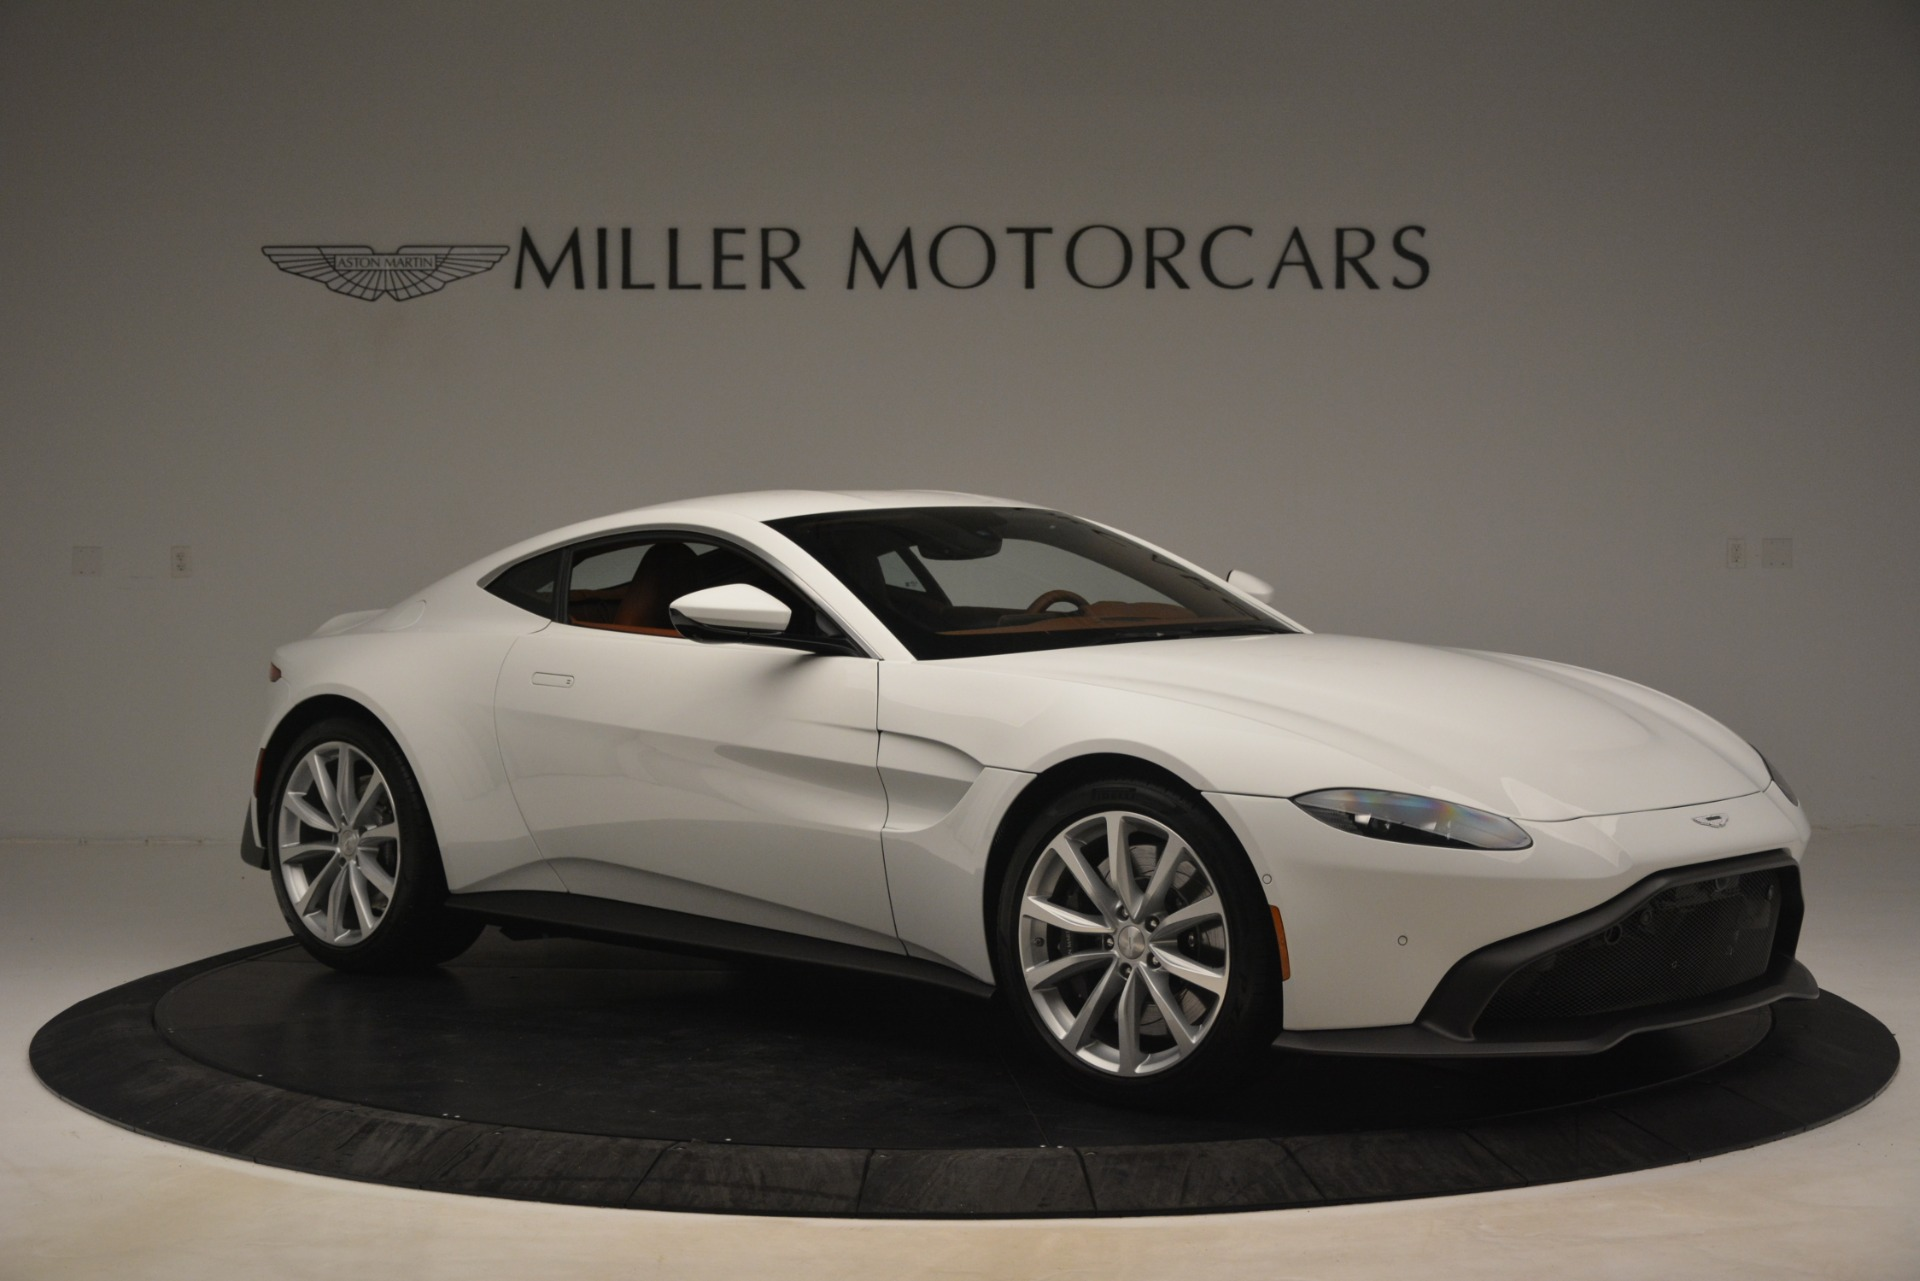 New 2019 Aston Martin Vantage Coupe For Sale In Greenwich, CT. Alfa Romeo of Greenwich, A1373 3227_p9